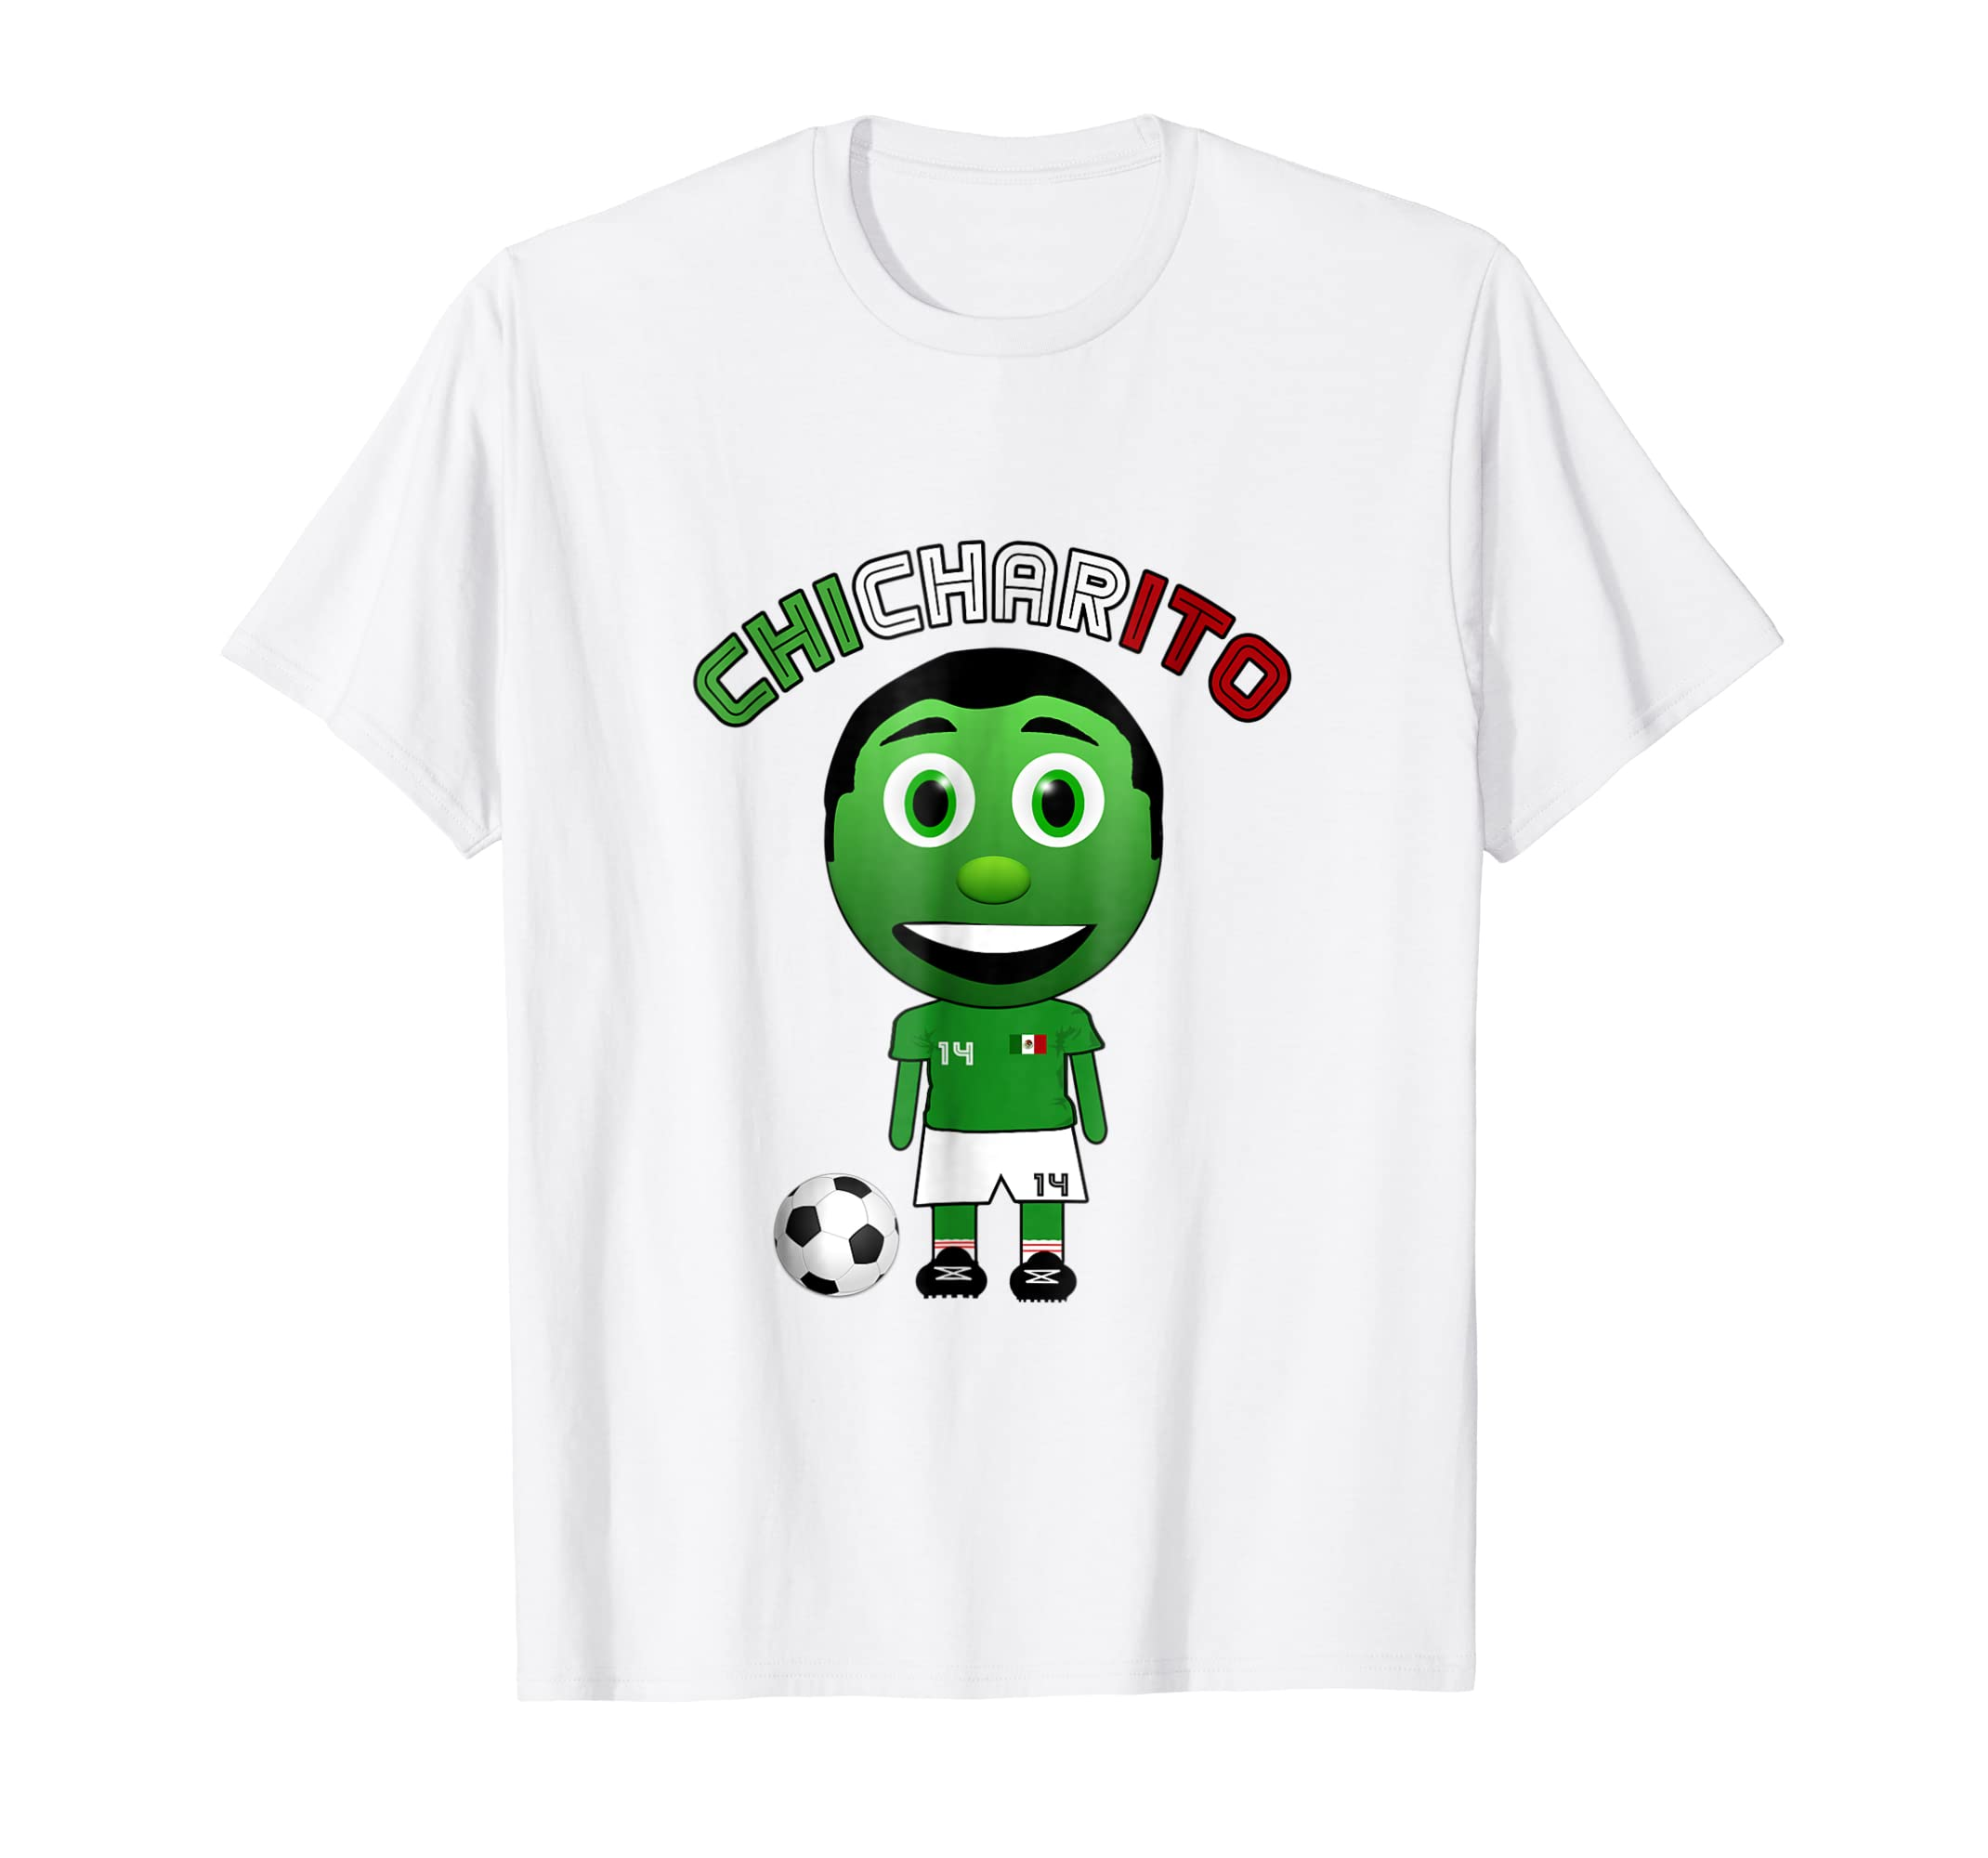 Amazon.com: Mexico Chicharito 14 Futbol National Team Men Women Shirt: Clothing